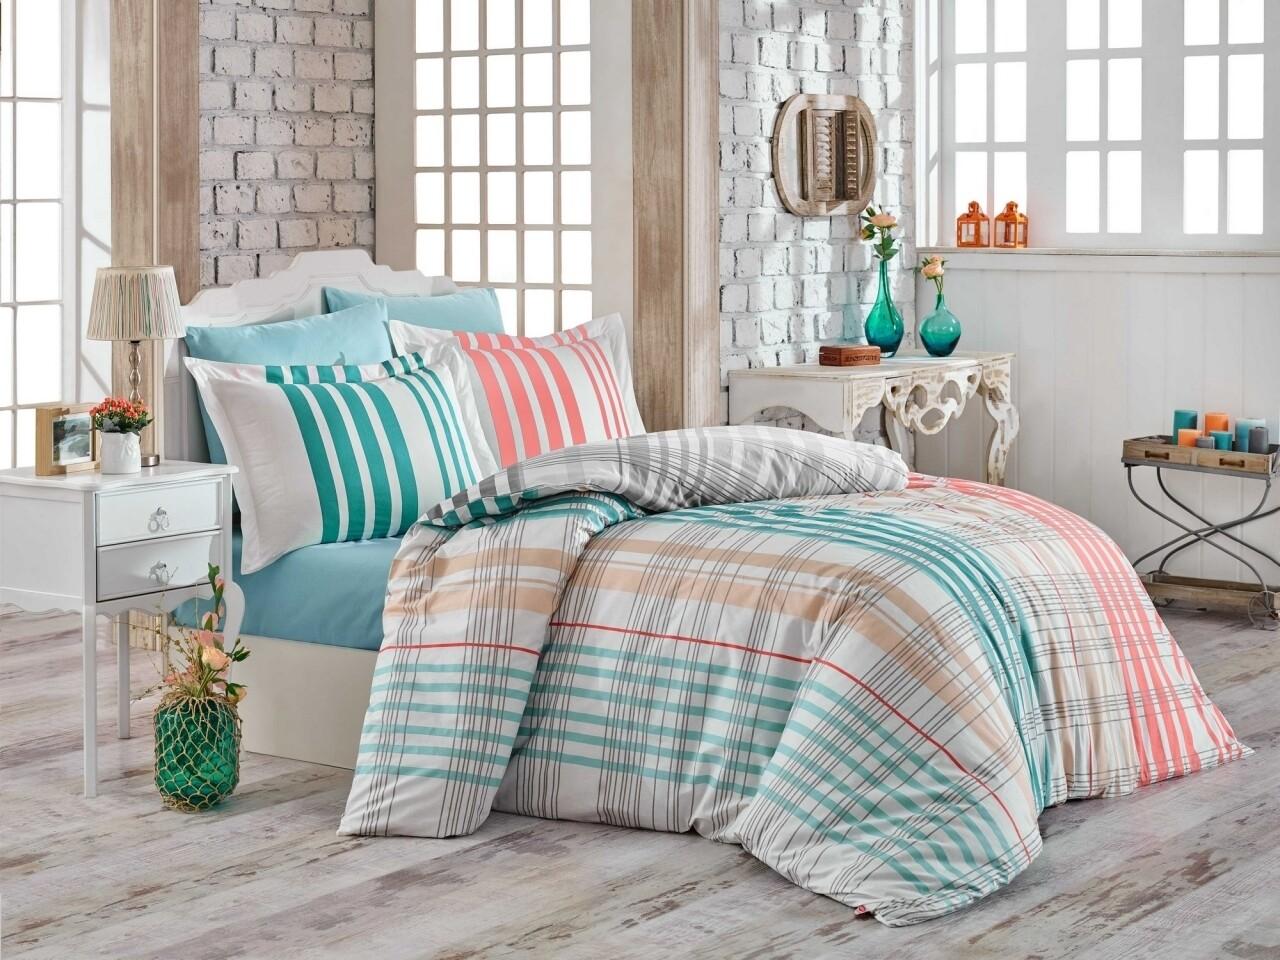 Lenjerie de pat pentru o persoana, 3 piese, 100% bumbac poplin, Hobby, Stripe Green, multicolora